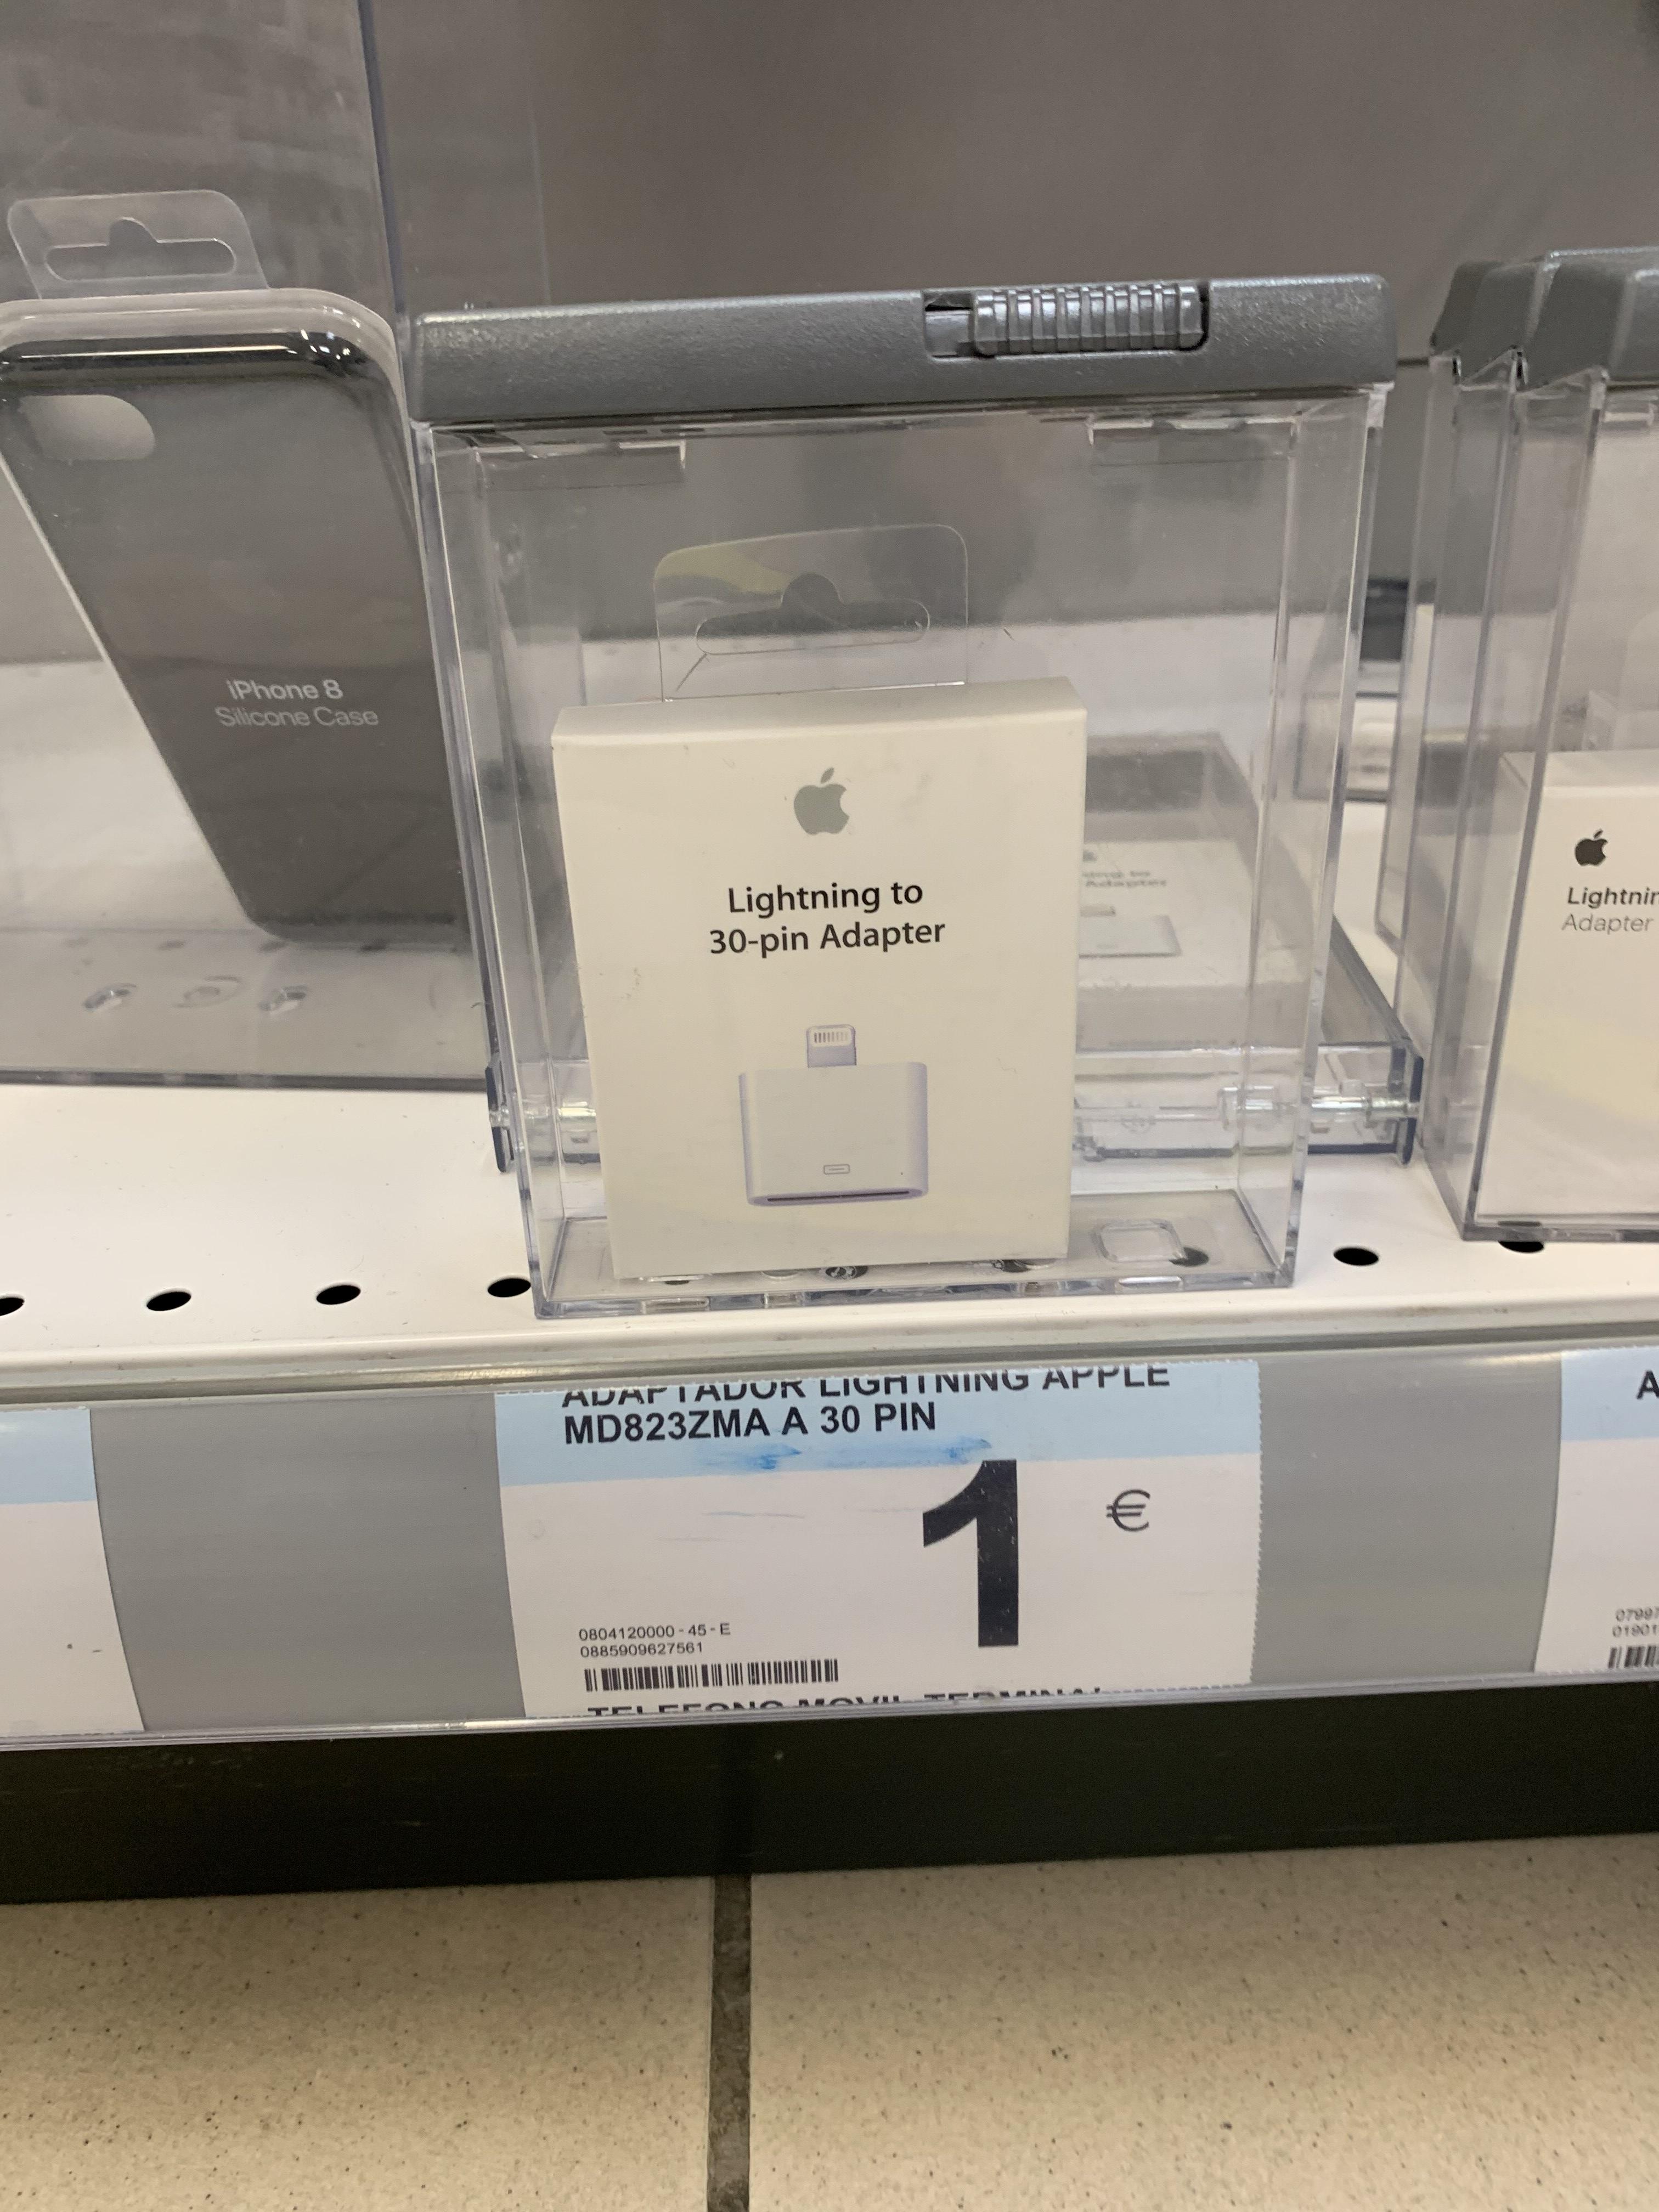 (Actualizado) Apple Adaptador 30-pin a Lightning (Carrefour Lorca, Murcia)